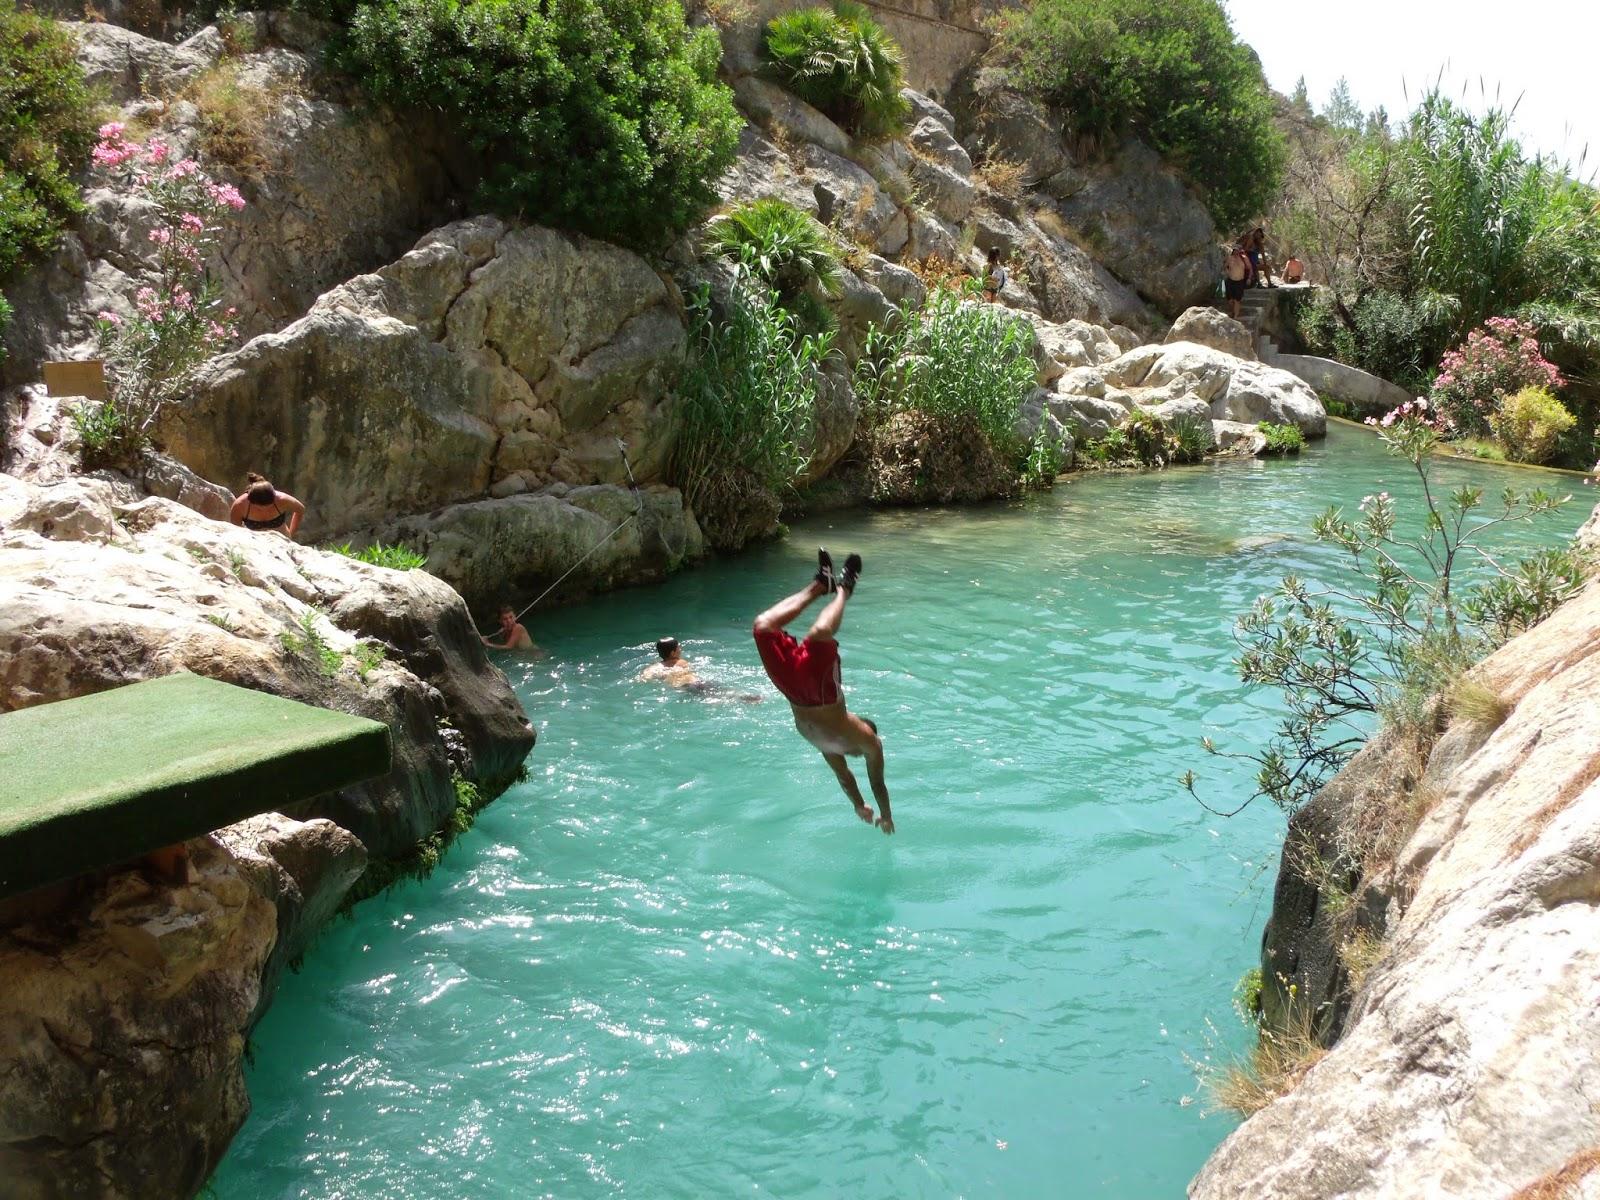 8 sitios donde poder ba arte en las monta as de alicante for Cubas de agua para llenar piscinas